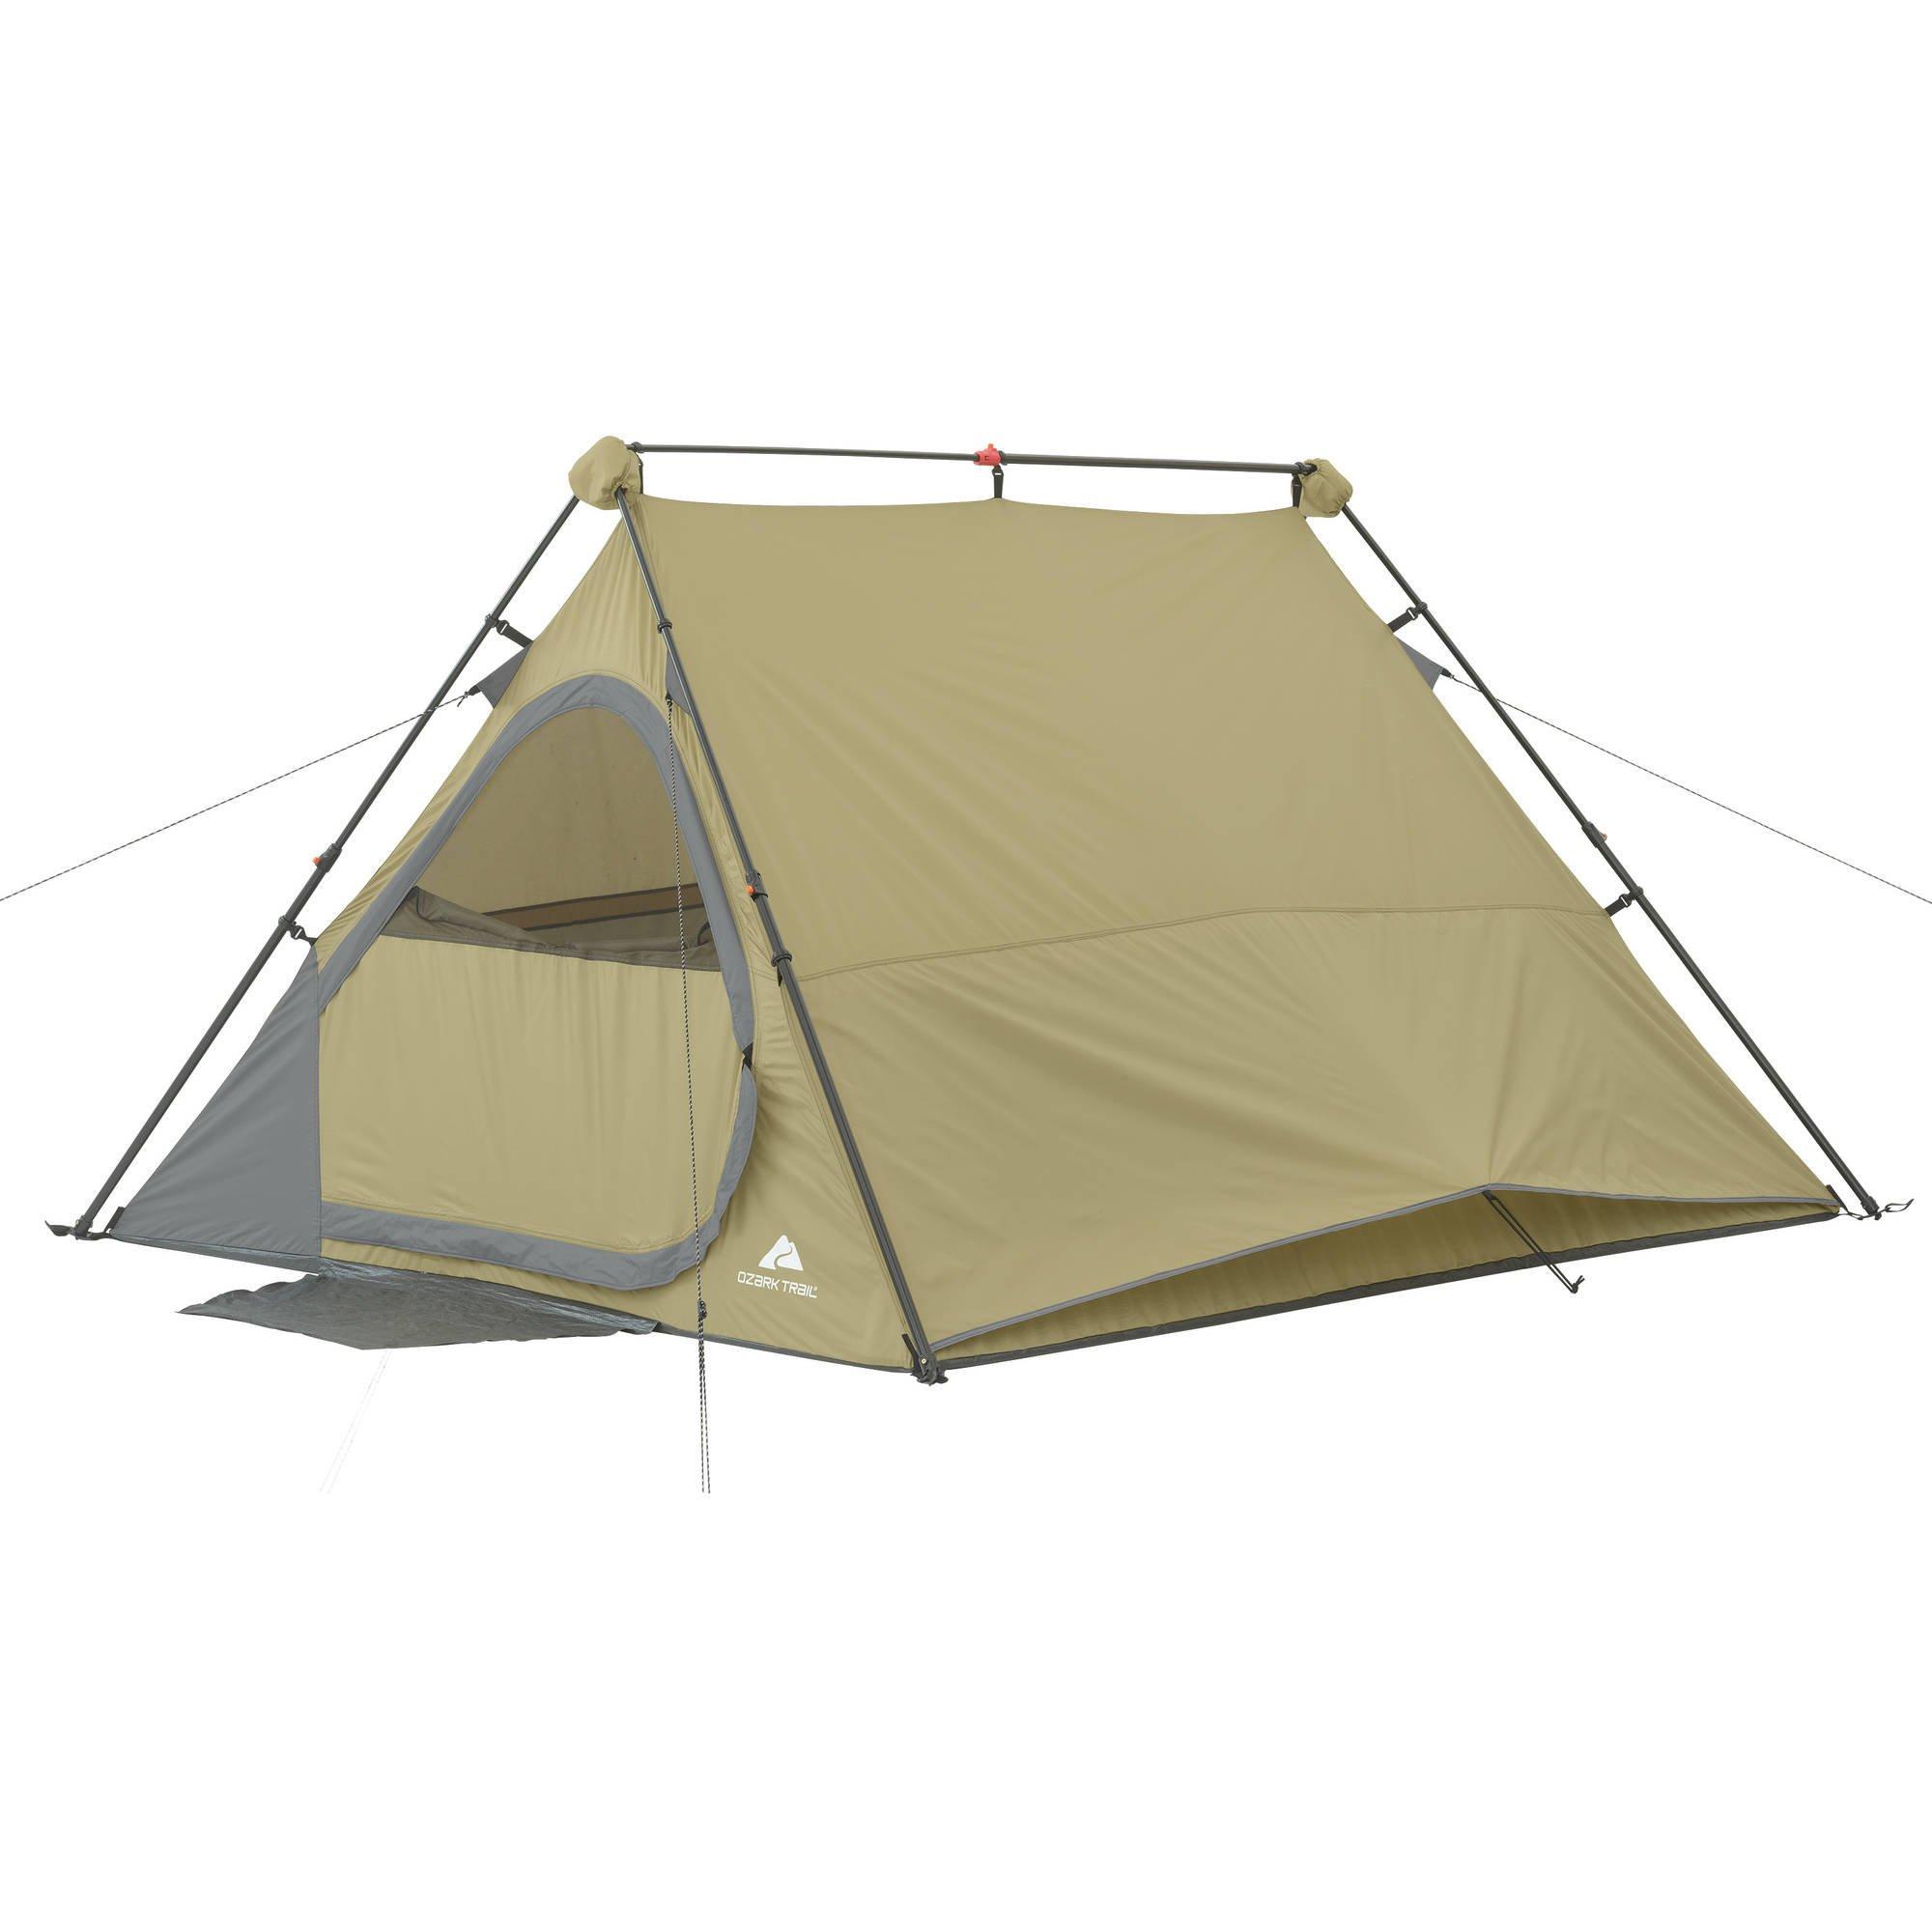 Ozark Trail 8' x 7' A Frame Instant Tent, Sleeps 4 Summer Beach Vacation Ozark Trail 8' x 7' A Frame Instant Tent, Sleeps 4 Summer Beach Vacation